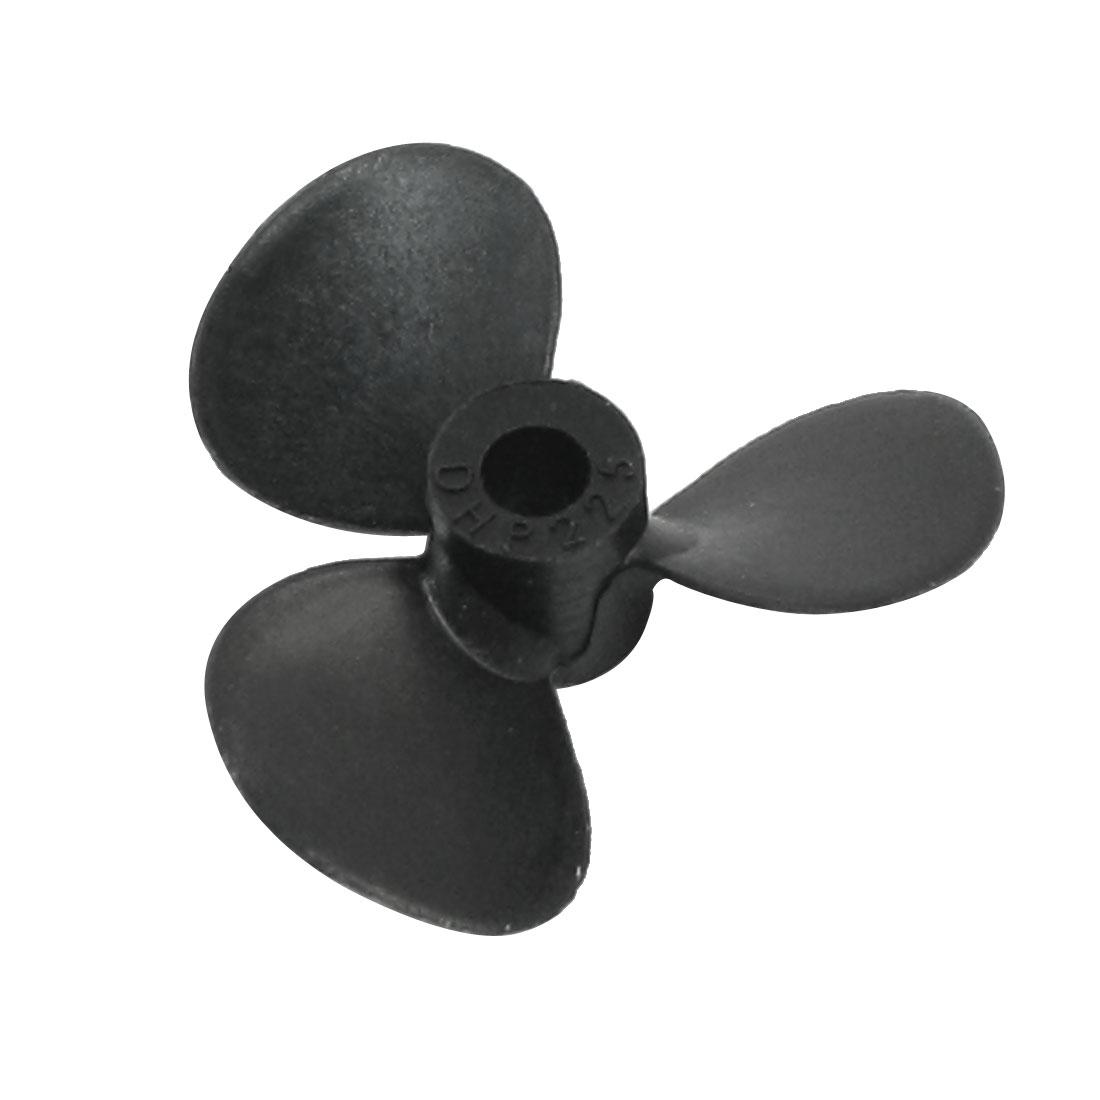 25mm Dia P/D 1.2 Black Plastic 3-Vane CCW Reverse Rotating Prop Propeller for 3mm Shaft RC Model Boat Ship